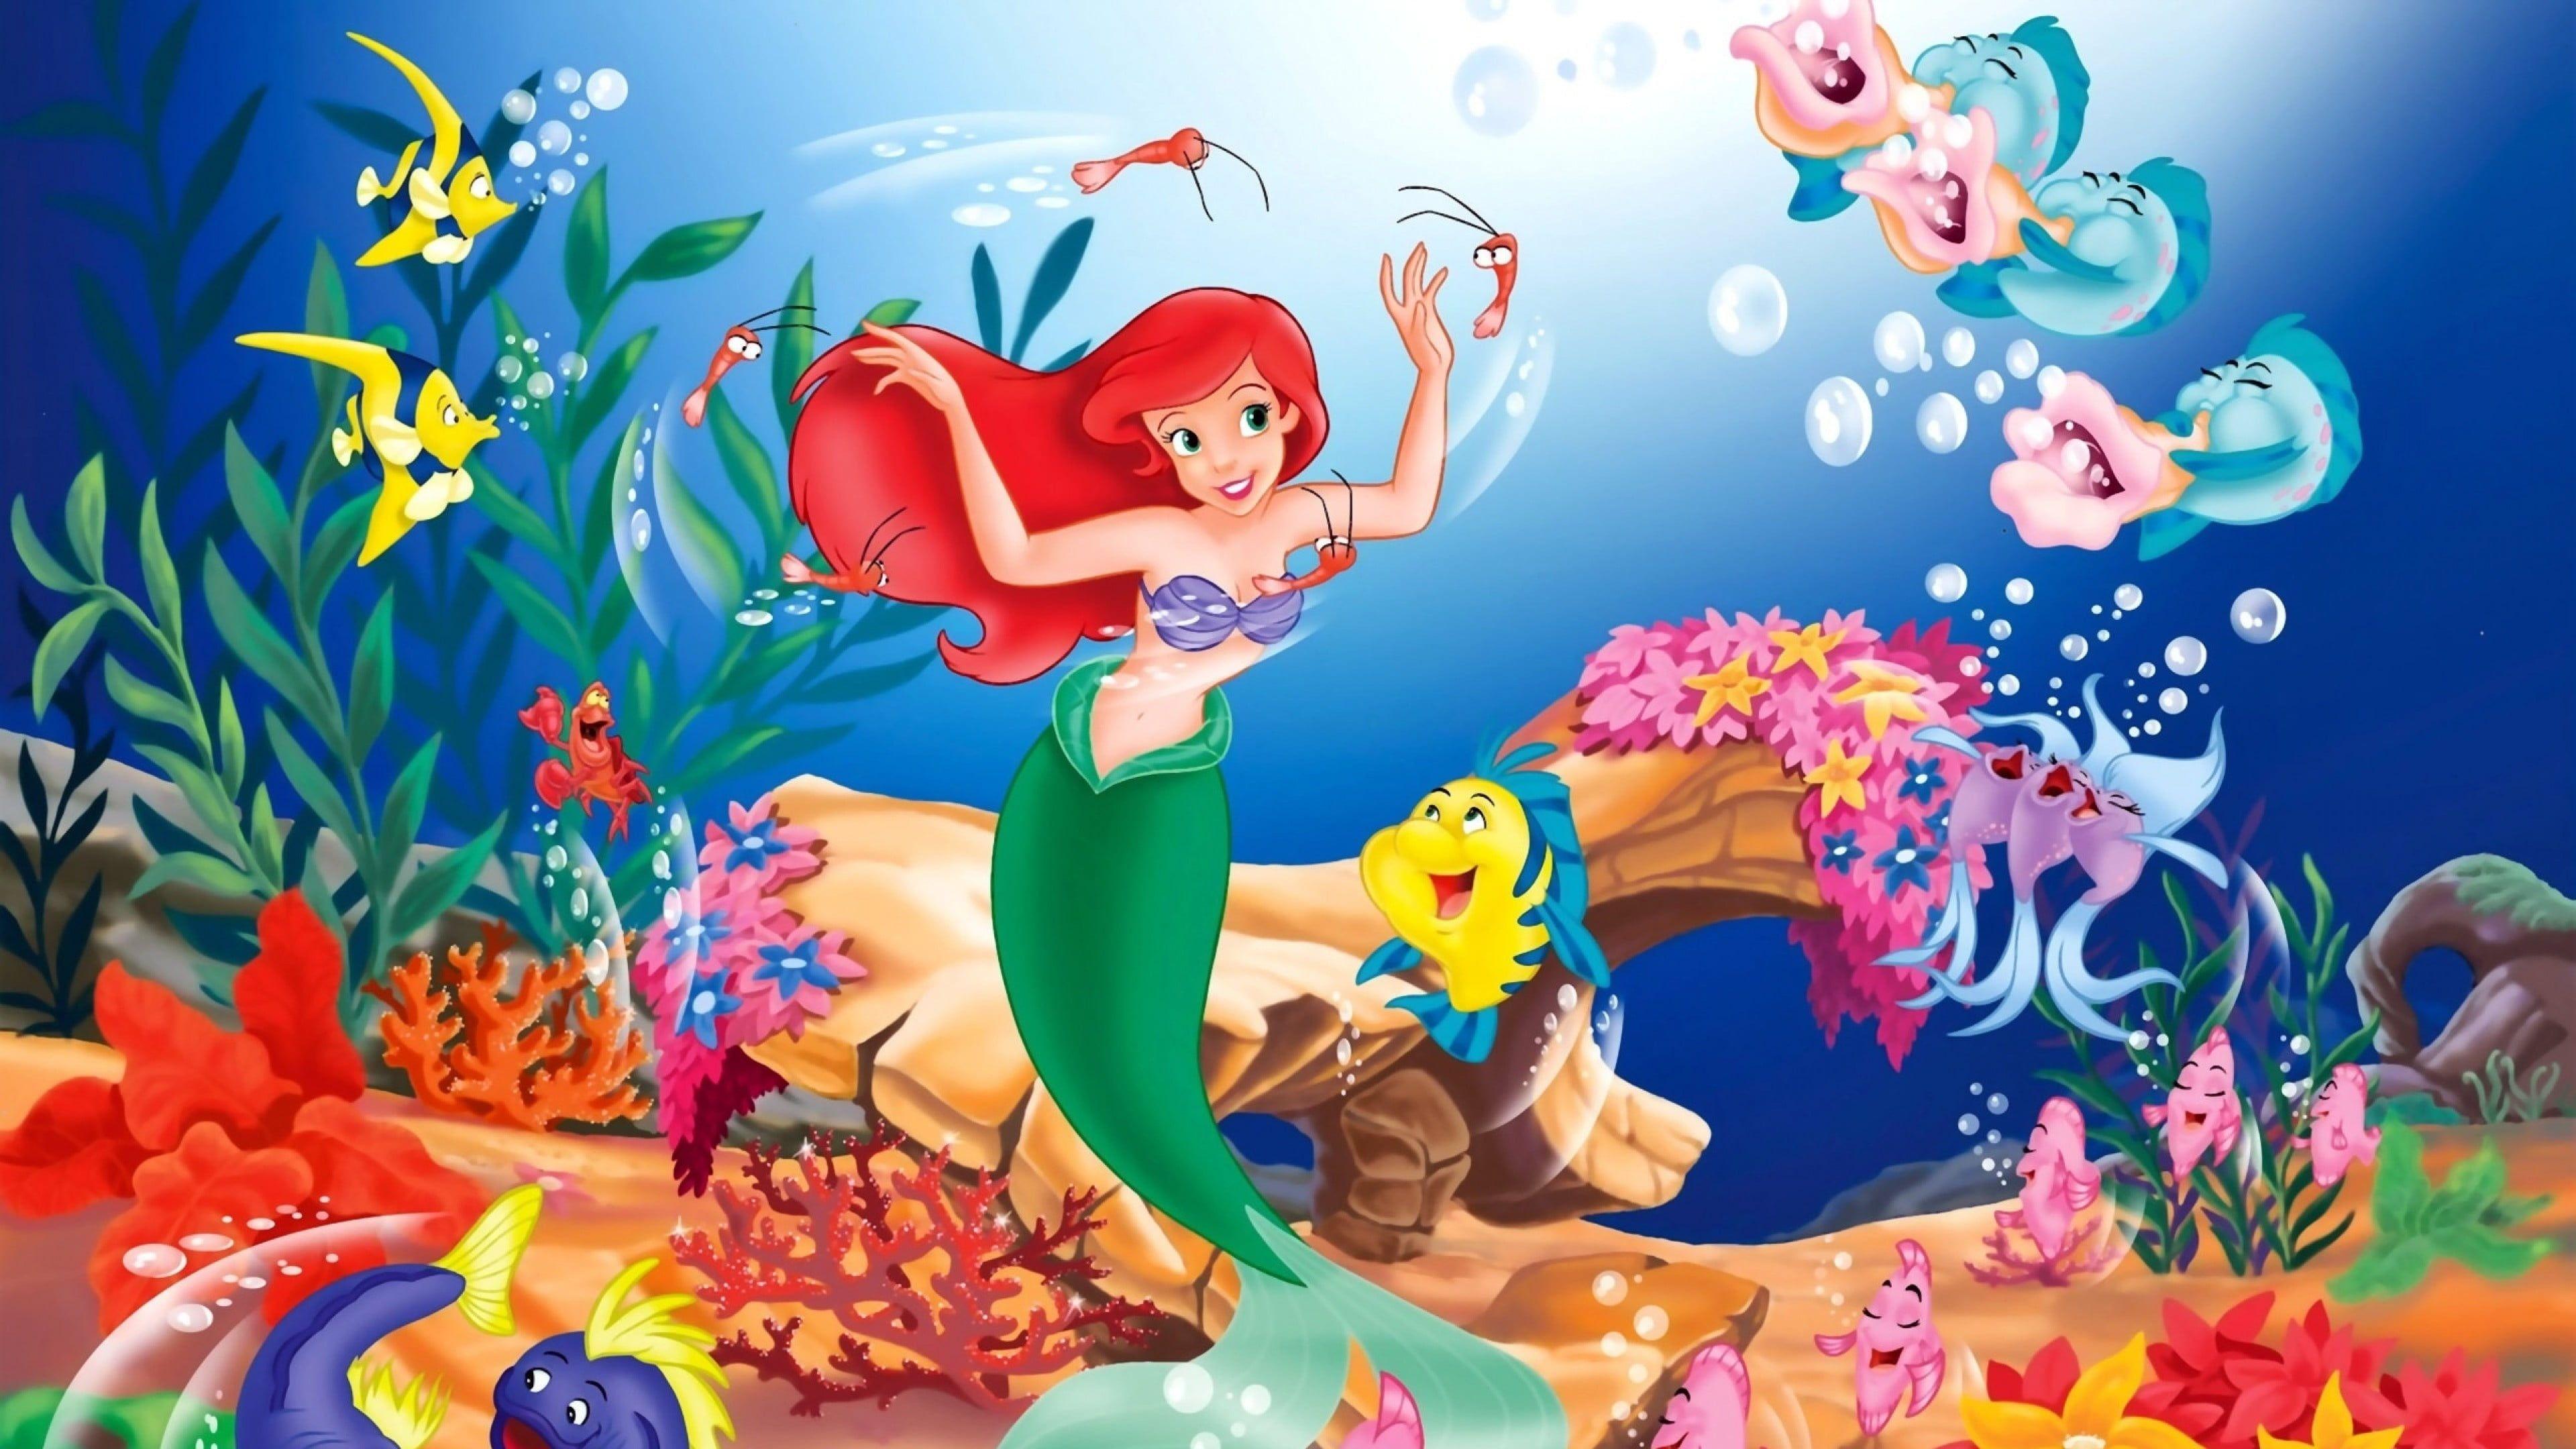 Disney Little Mermaid Underwater Wallpaper Fantasy Art Digital Art